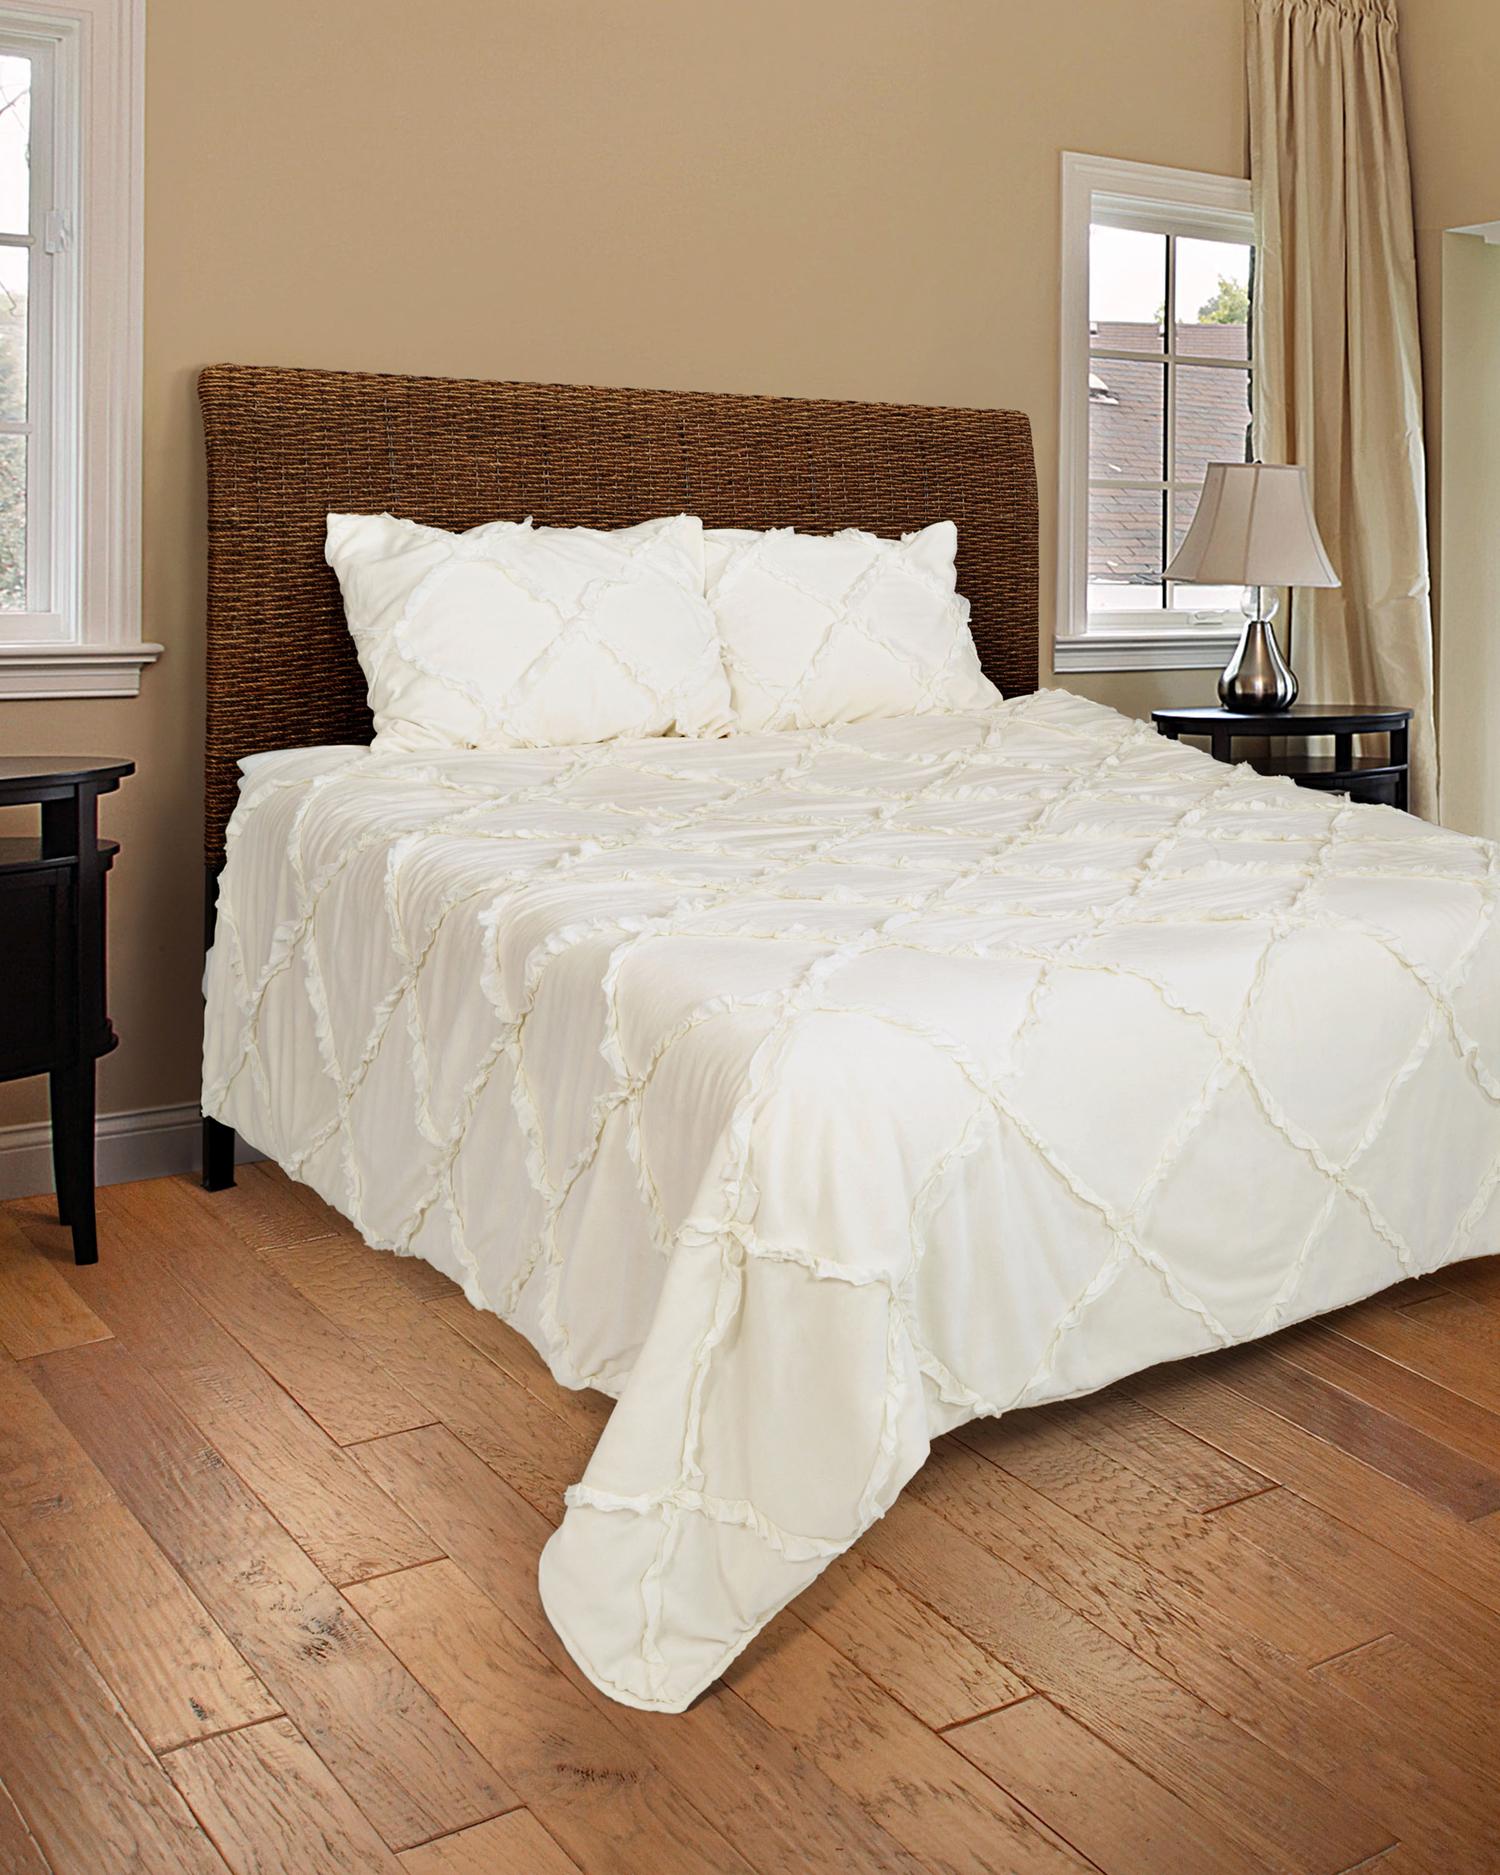 Posh Ivory By Rizzy Home Bedding Beddingsuperstore Com